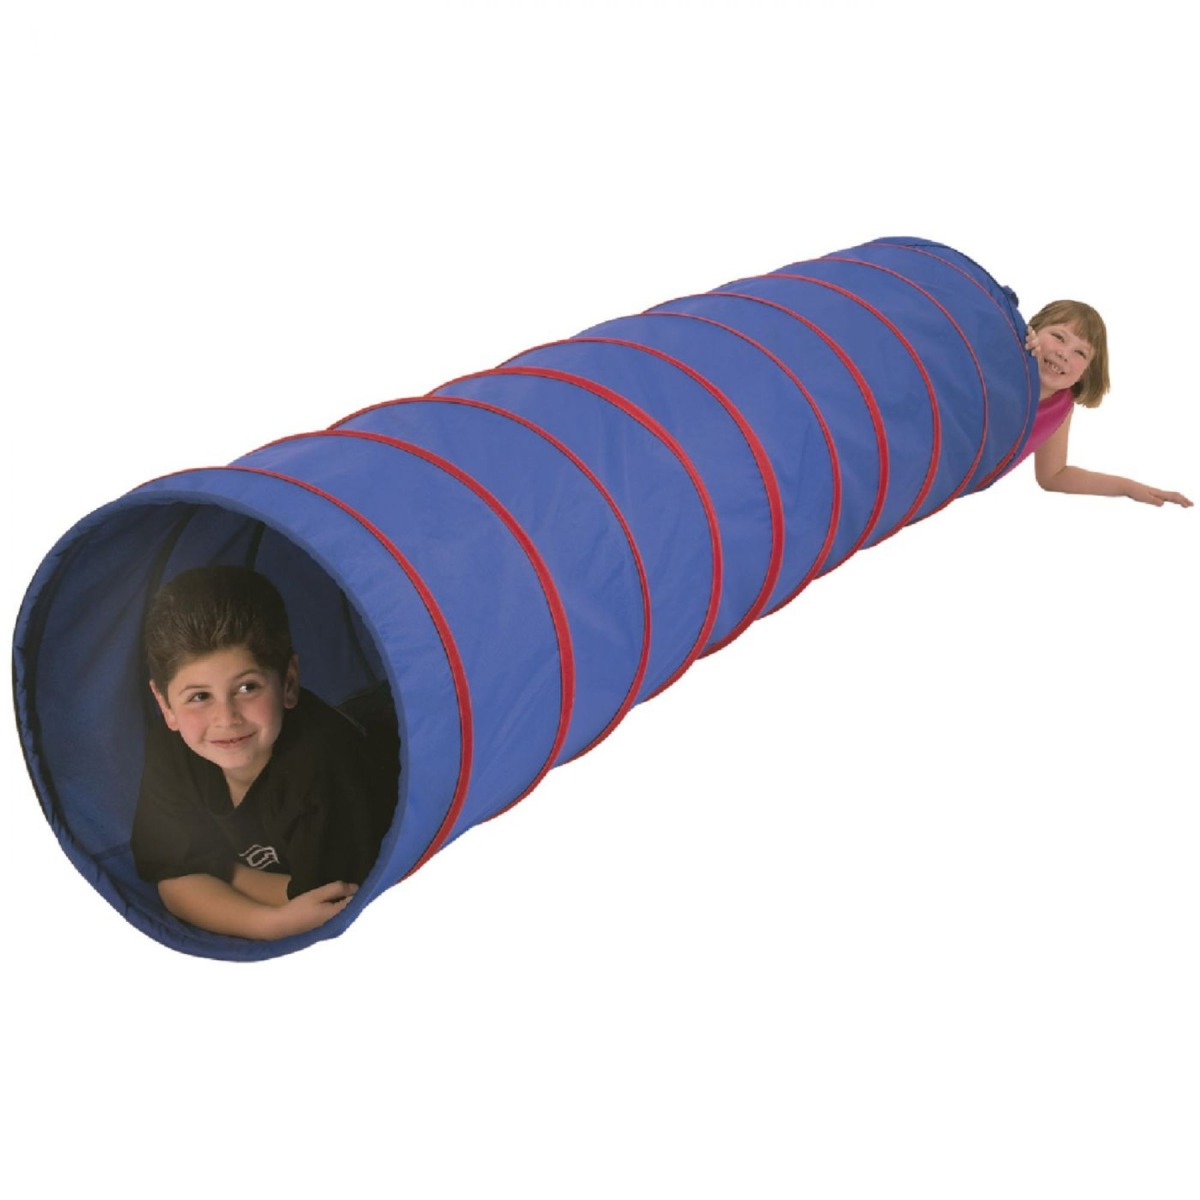 Pop-Up Tunnel